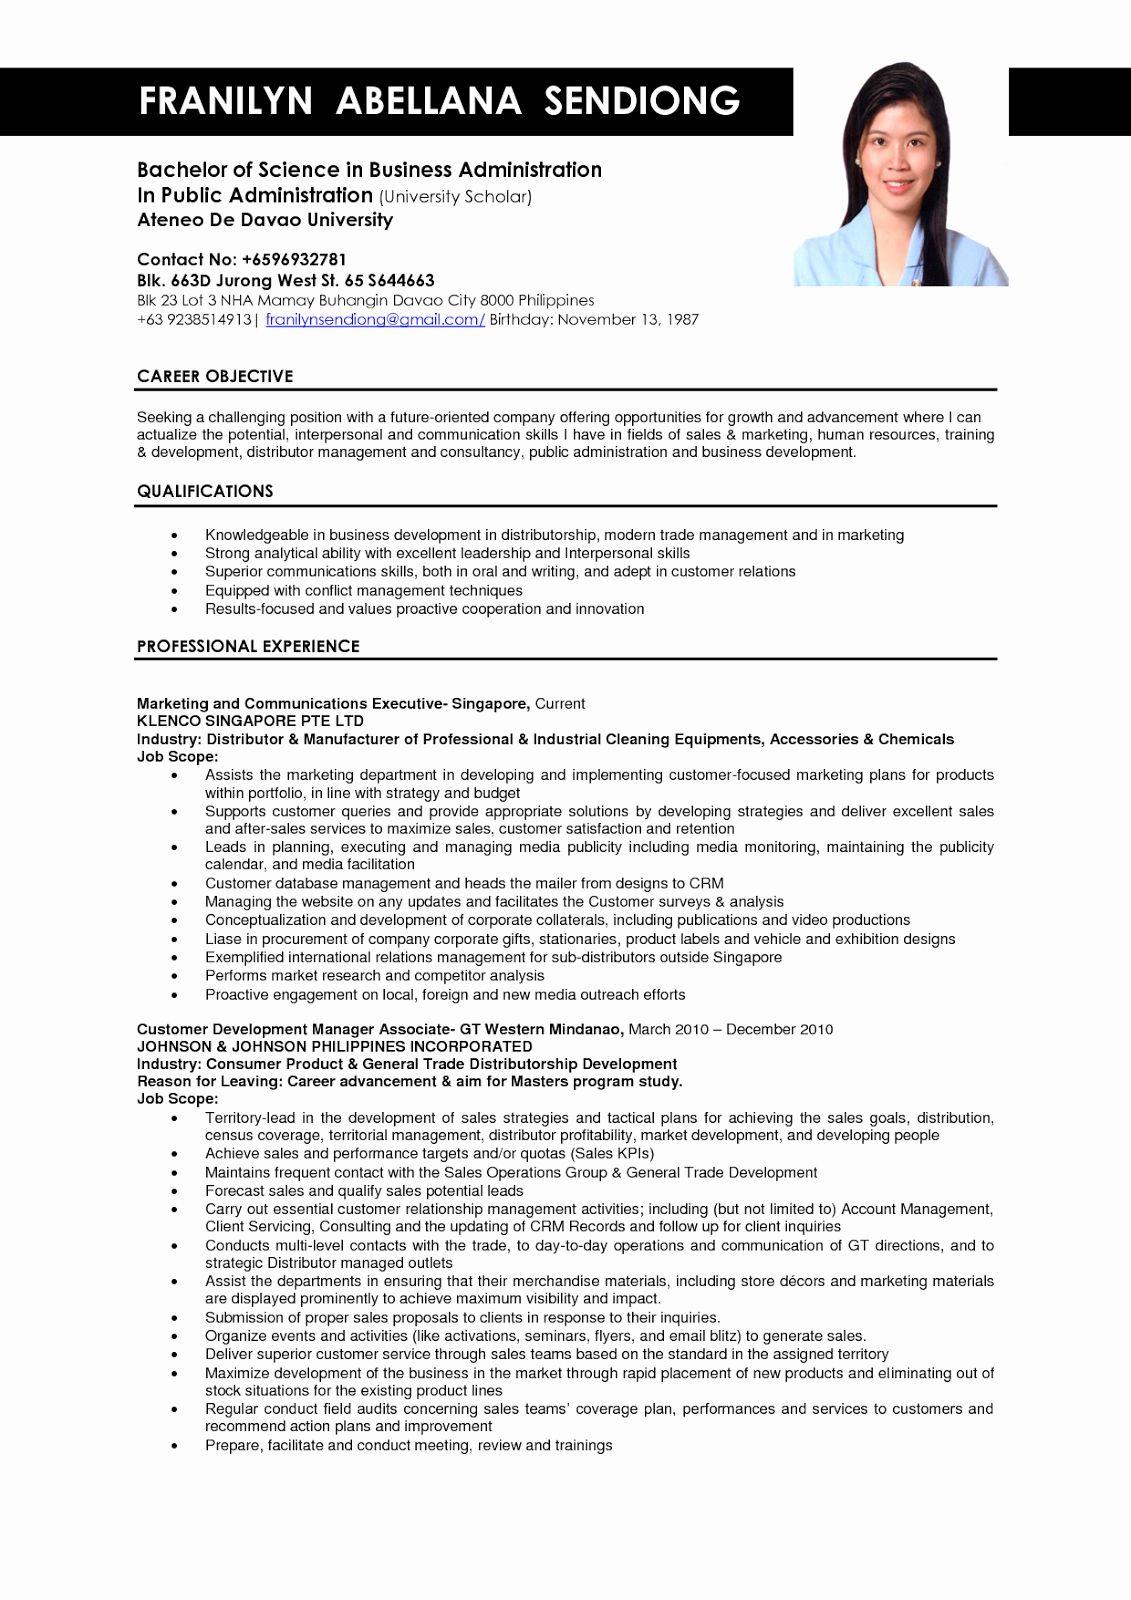 20 Key Holder Job Description Resume in 2020 Job resume